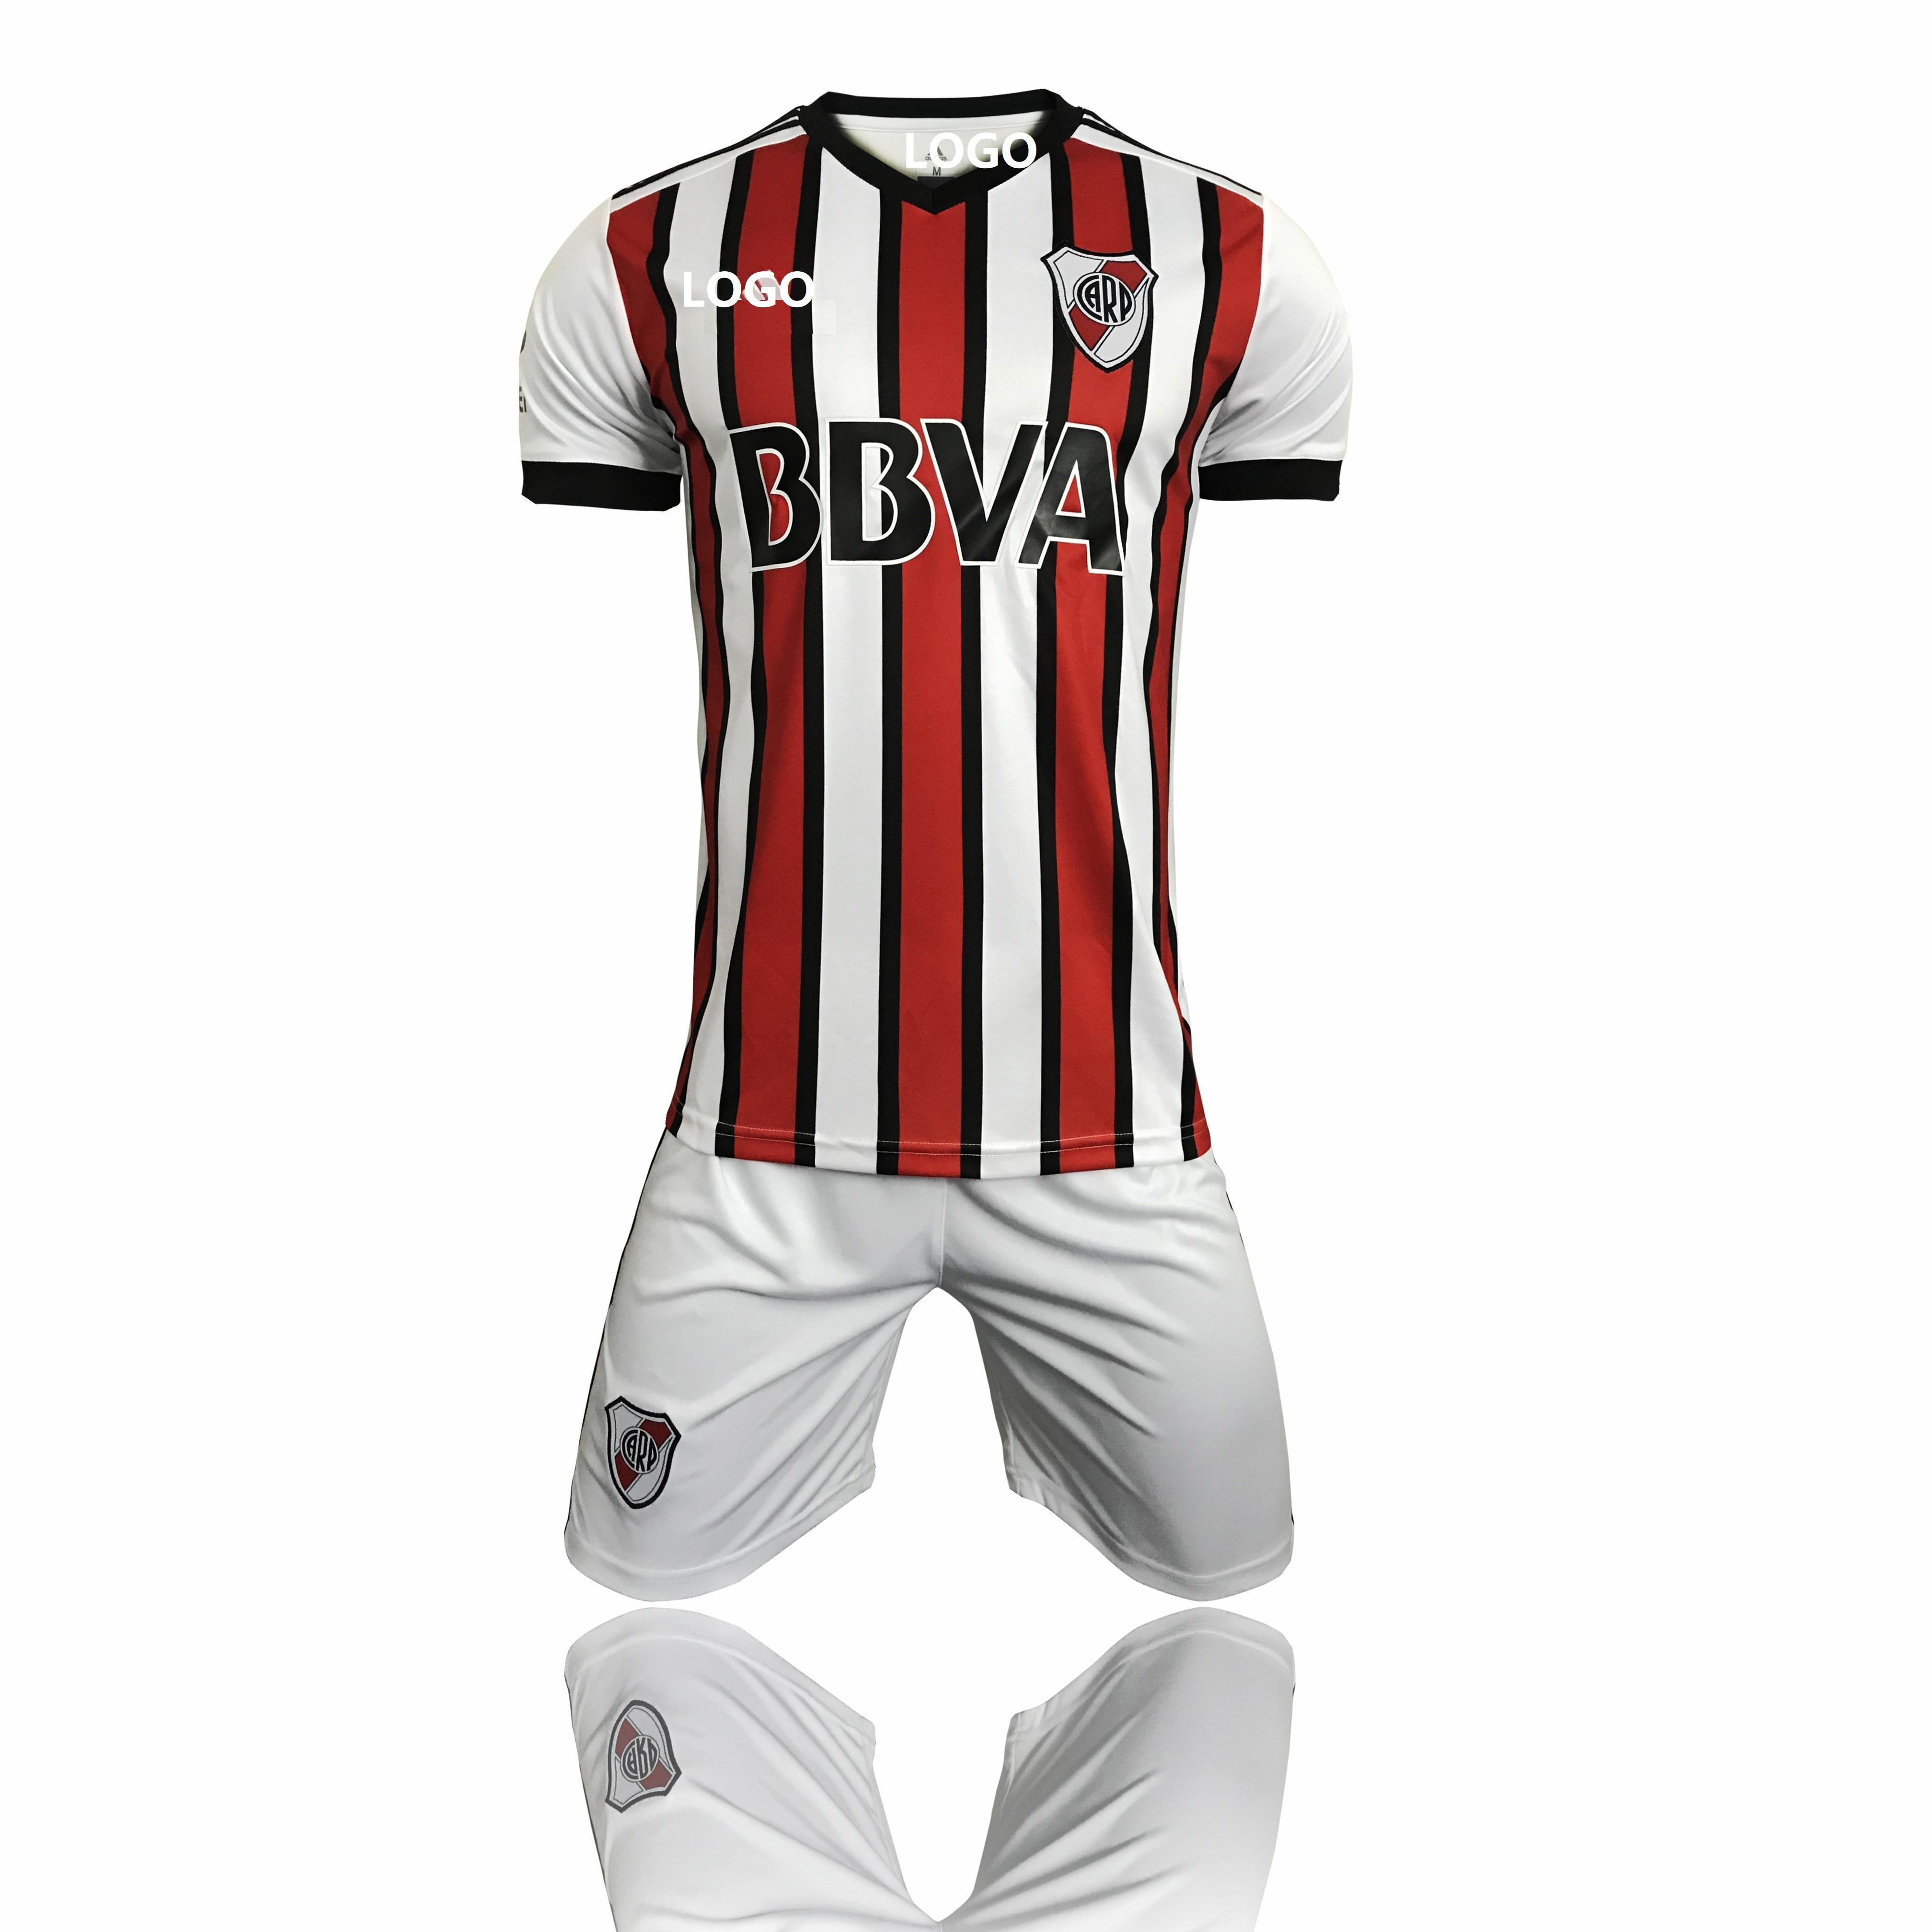 89ca2eccc99 2018 River Third Away Adult Soccer Jersey Uniform Kits Men Football Shirt  and Short Custom Soccer Jersey Uniform